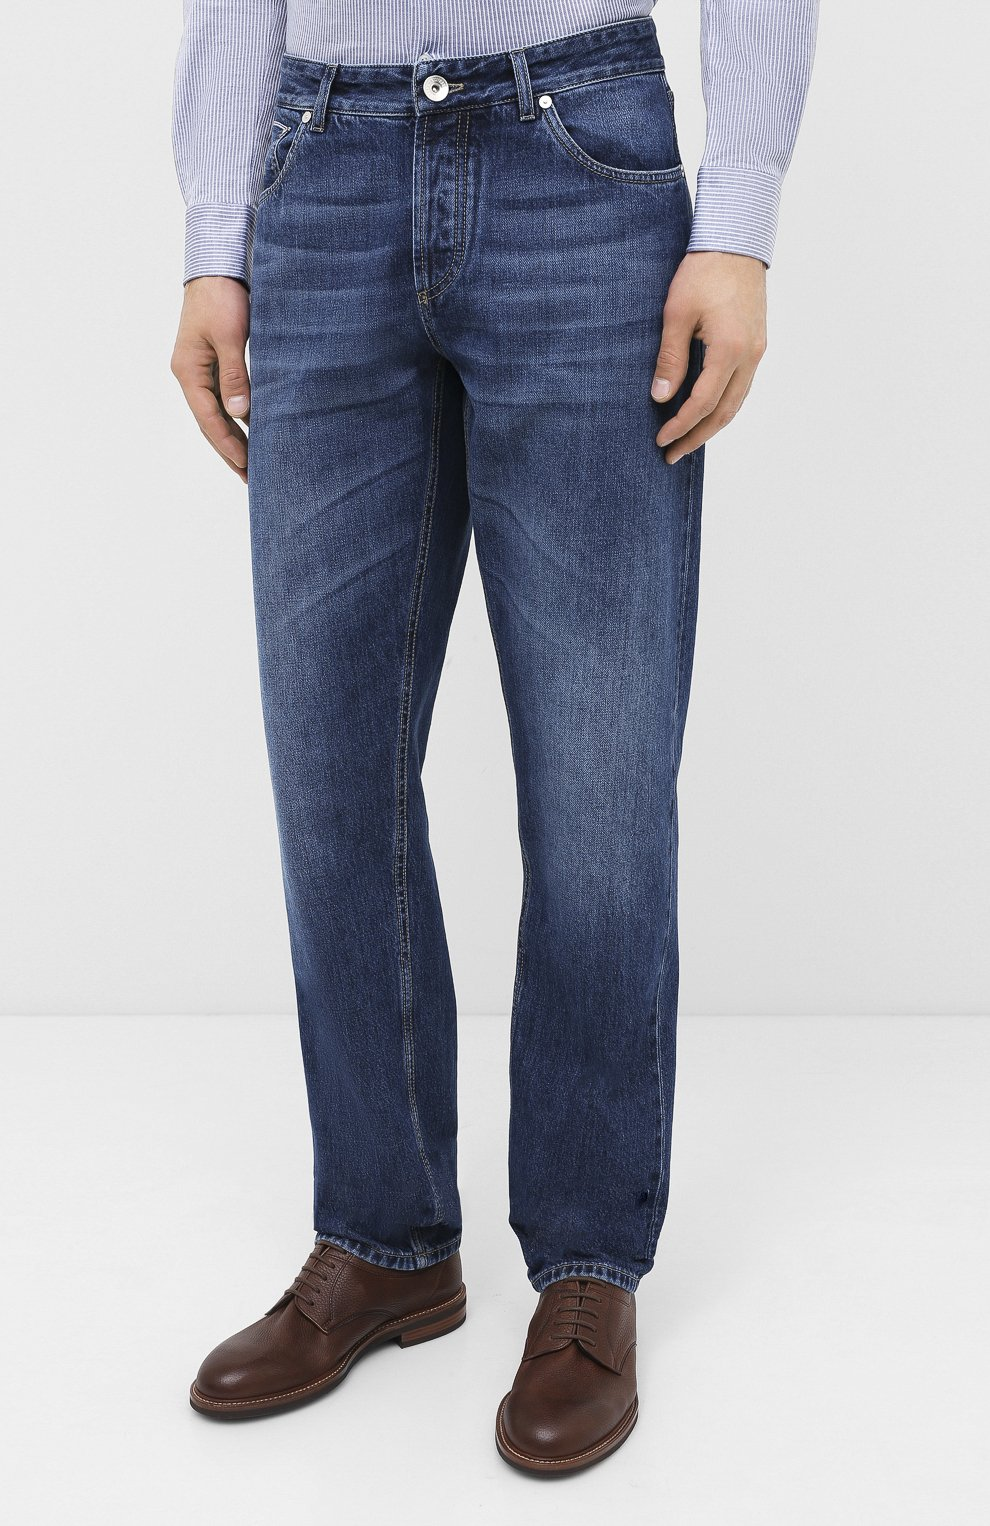 Мужские джинсы BRUNELLO CUCINELLI синего цвета, арт. ME228D2220 | Фото 3